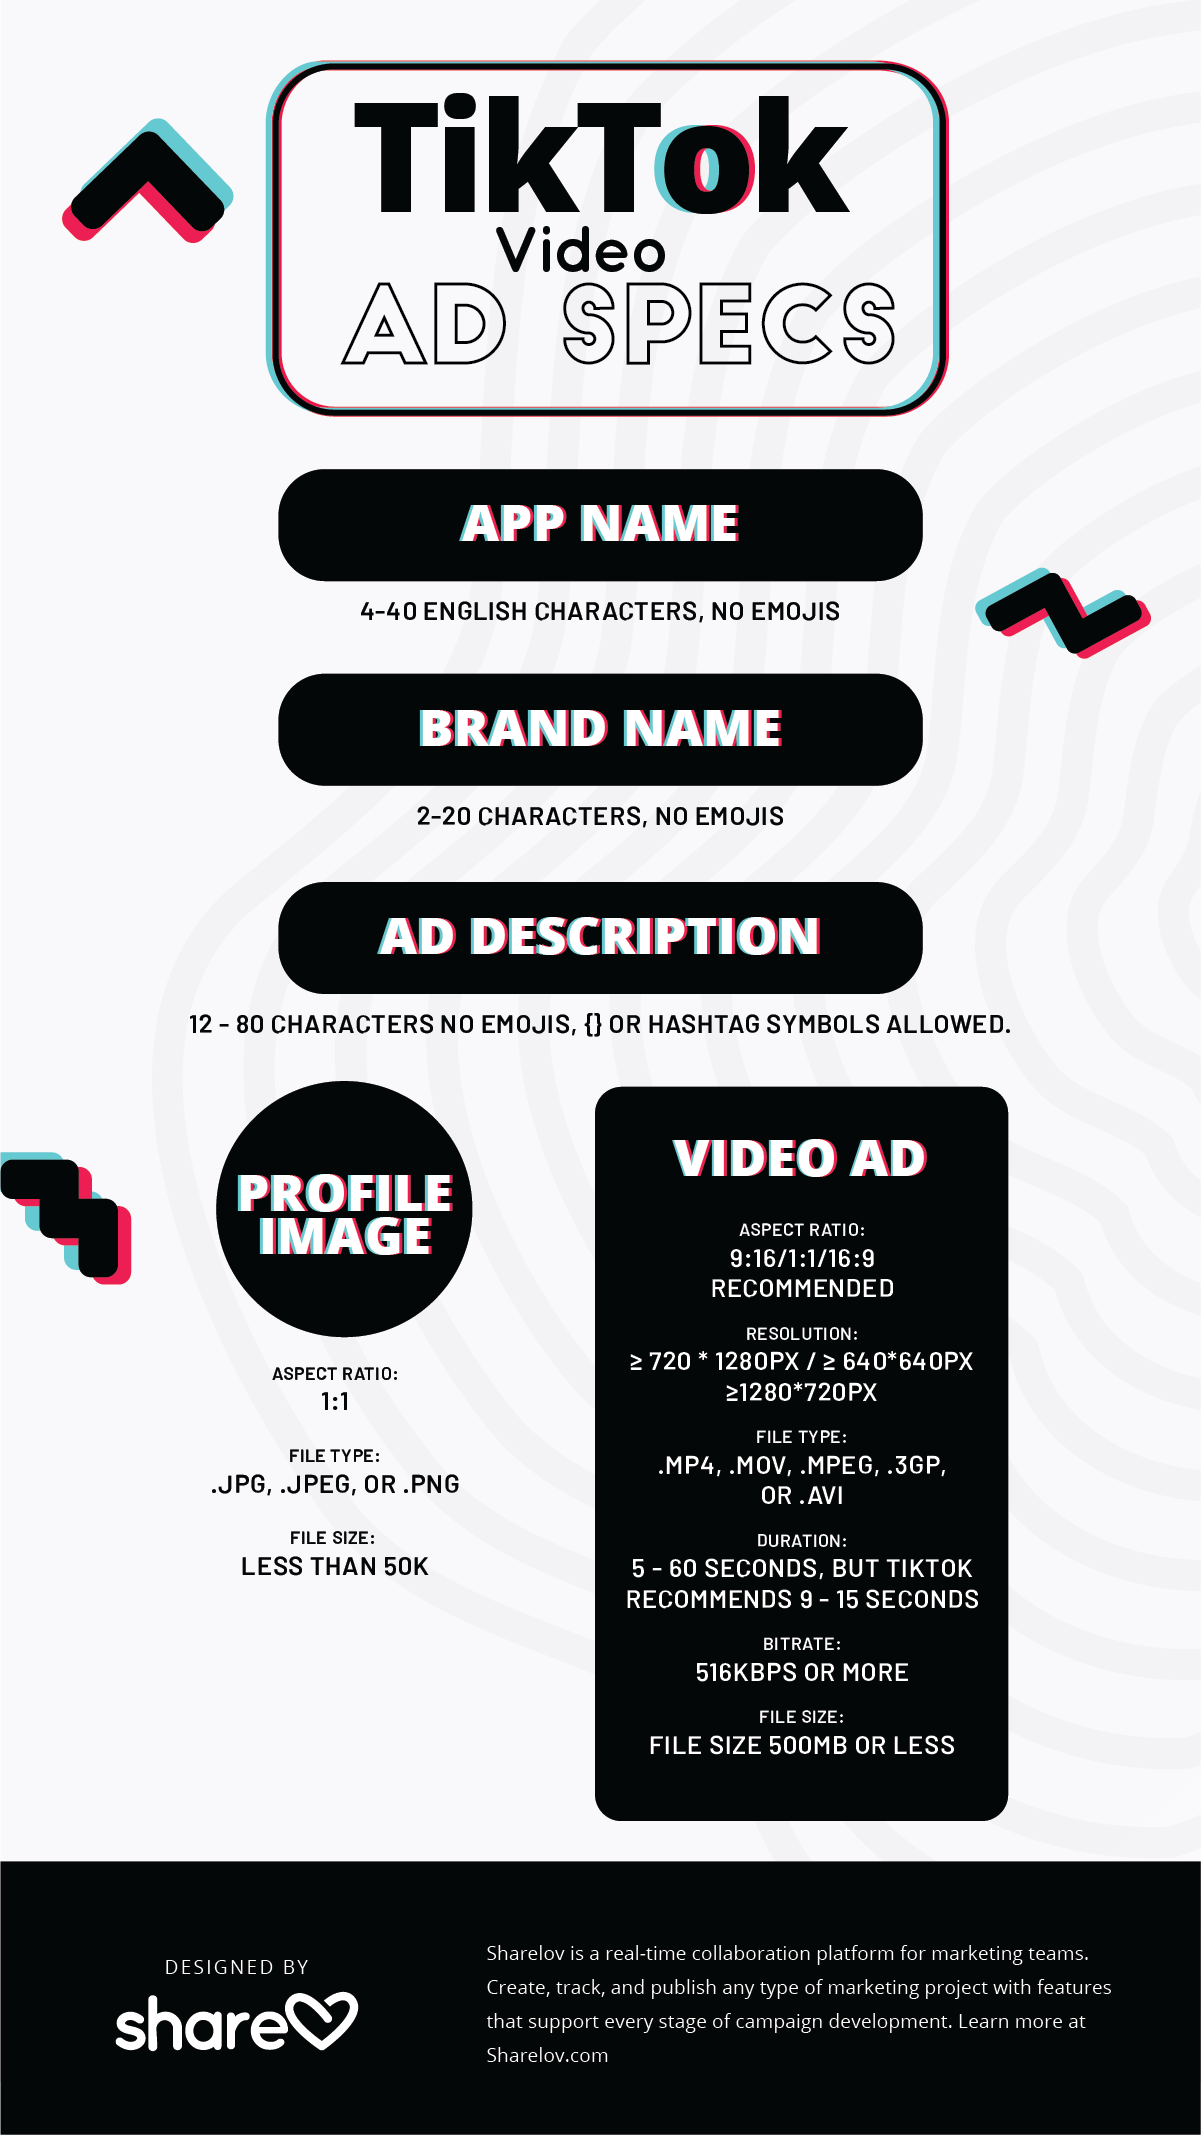 tiktok-video-ad-specs